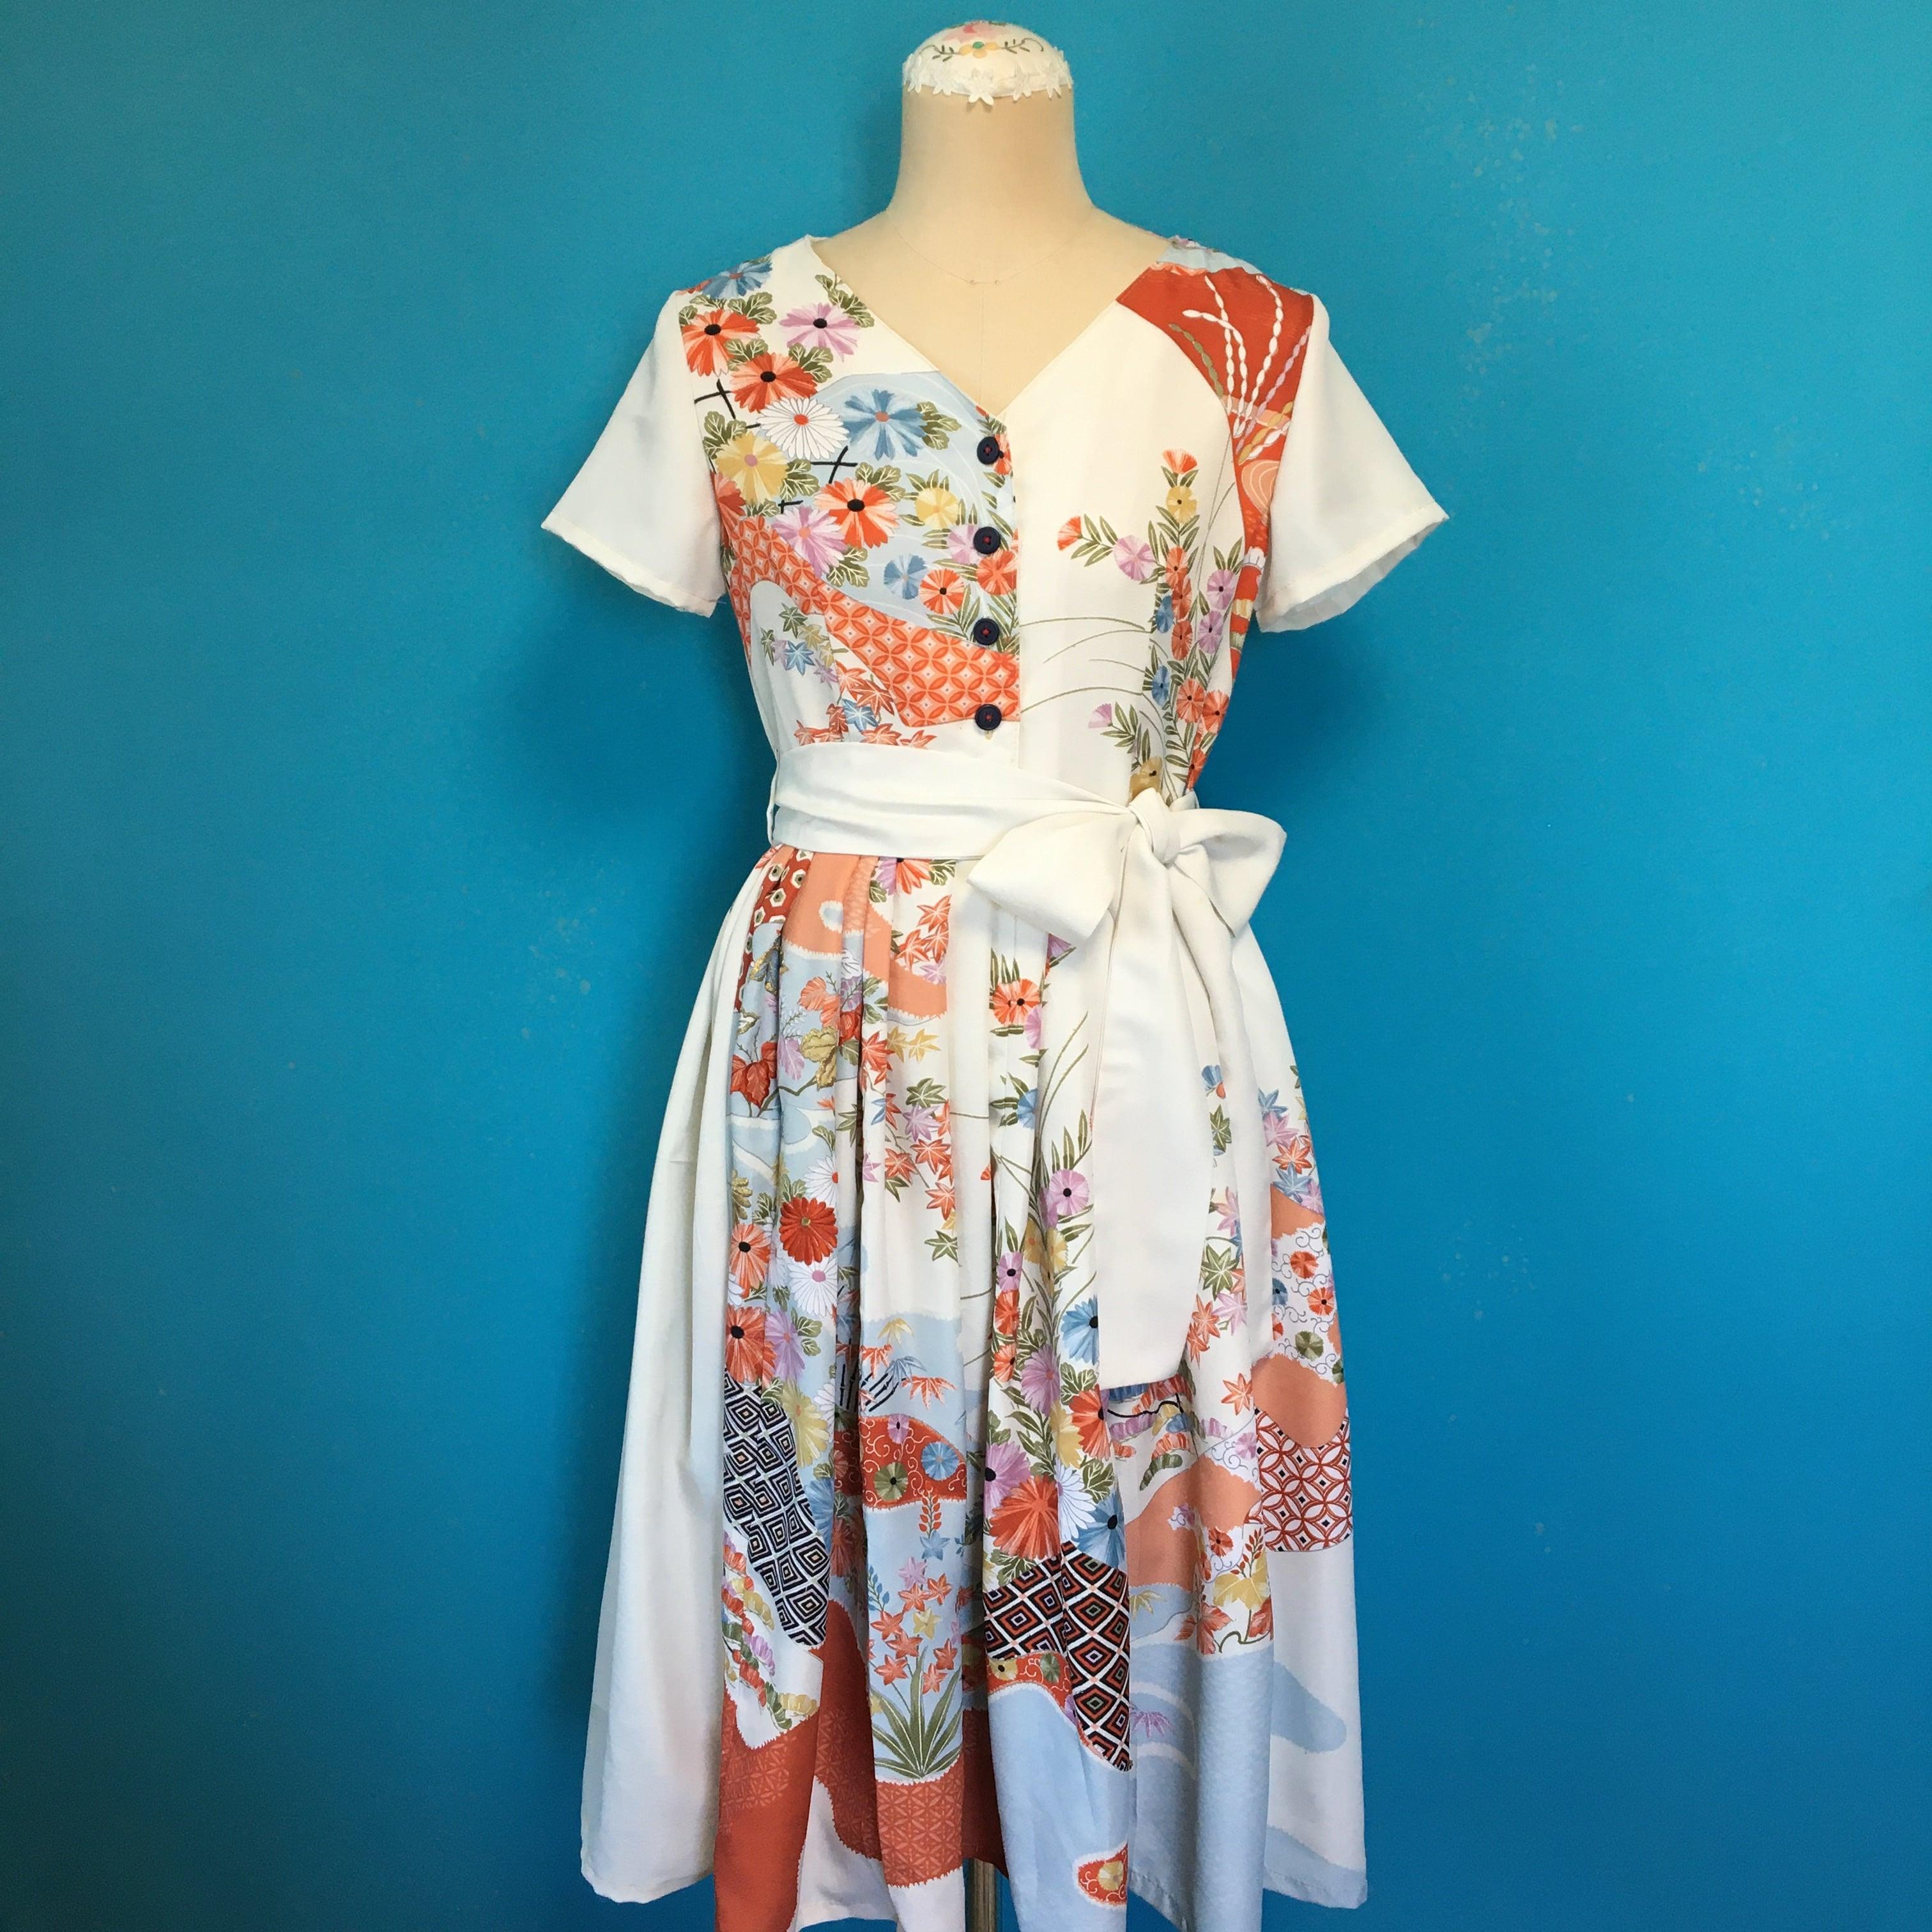 Vintage 化繊訪問着の刺繍ワンピース